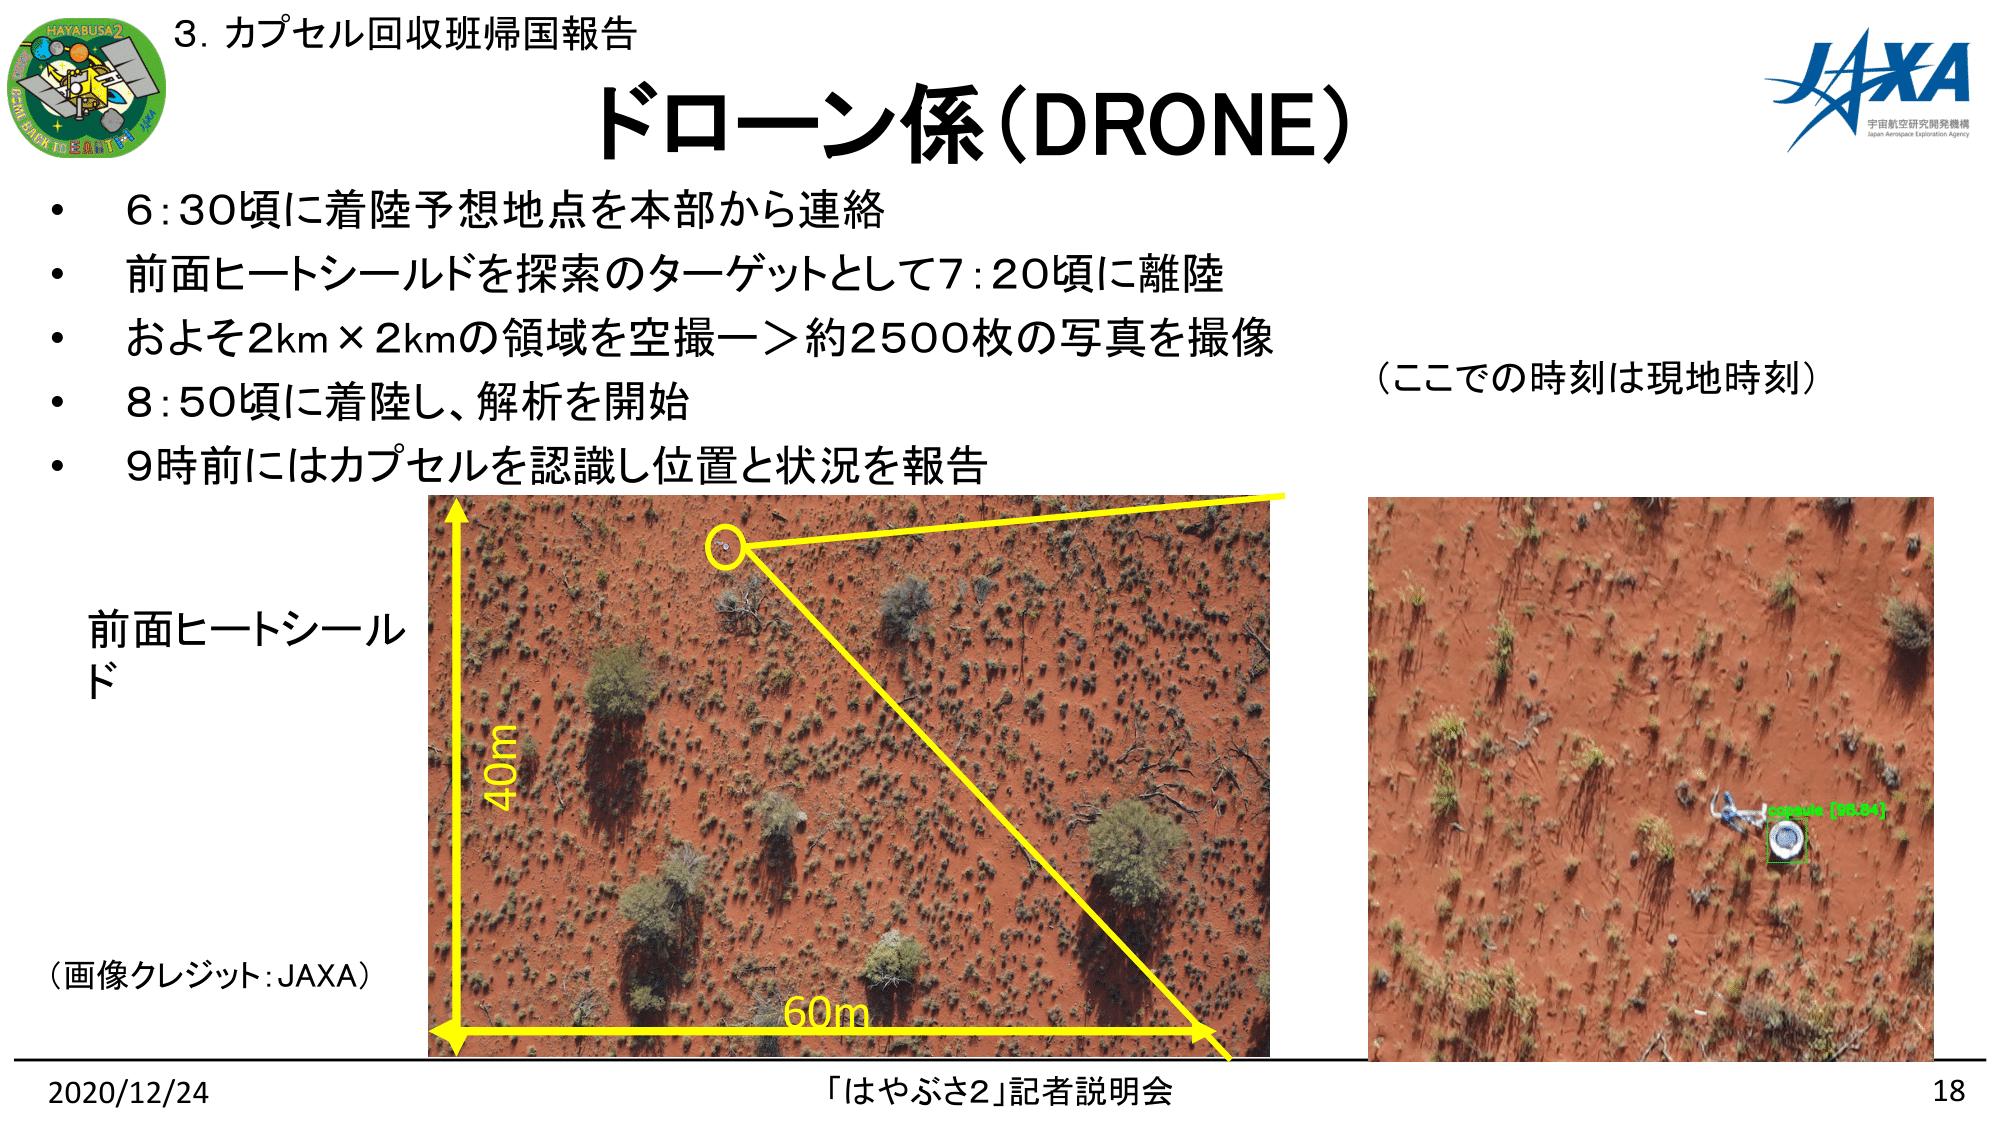 f:id:Imamura:20201224135152p:plain